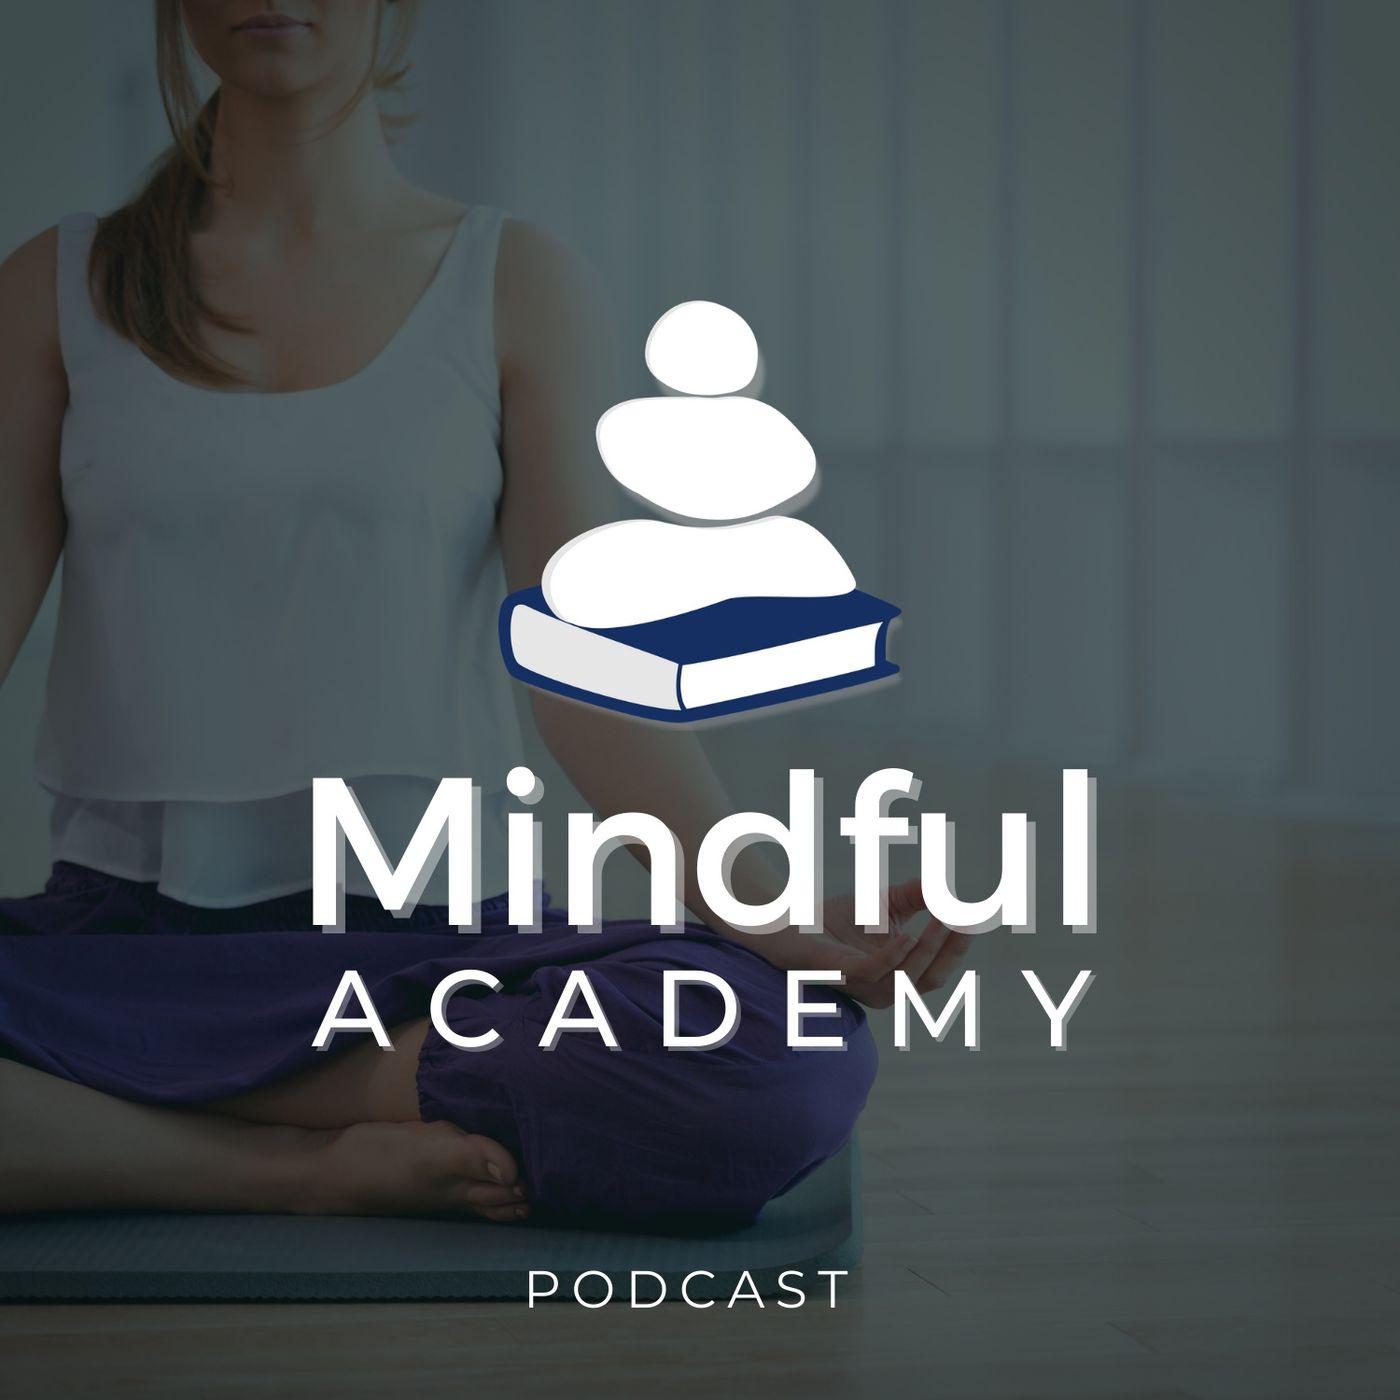 Mindful Academy